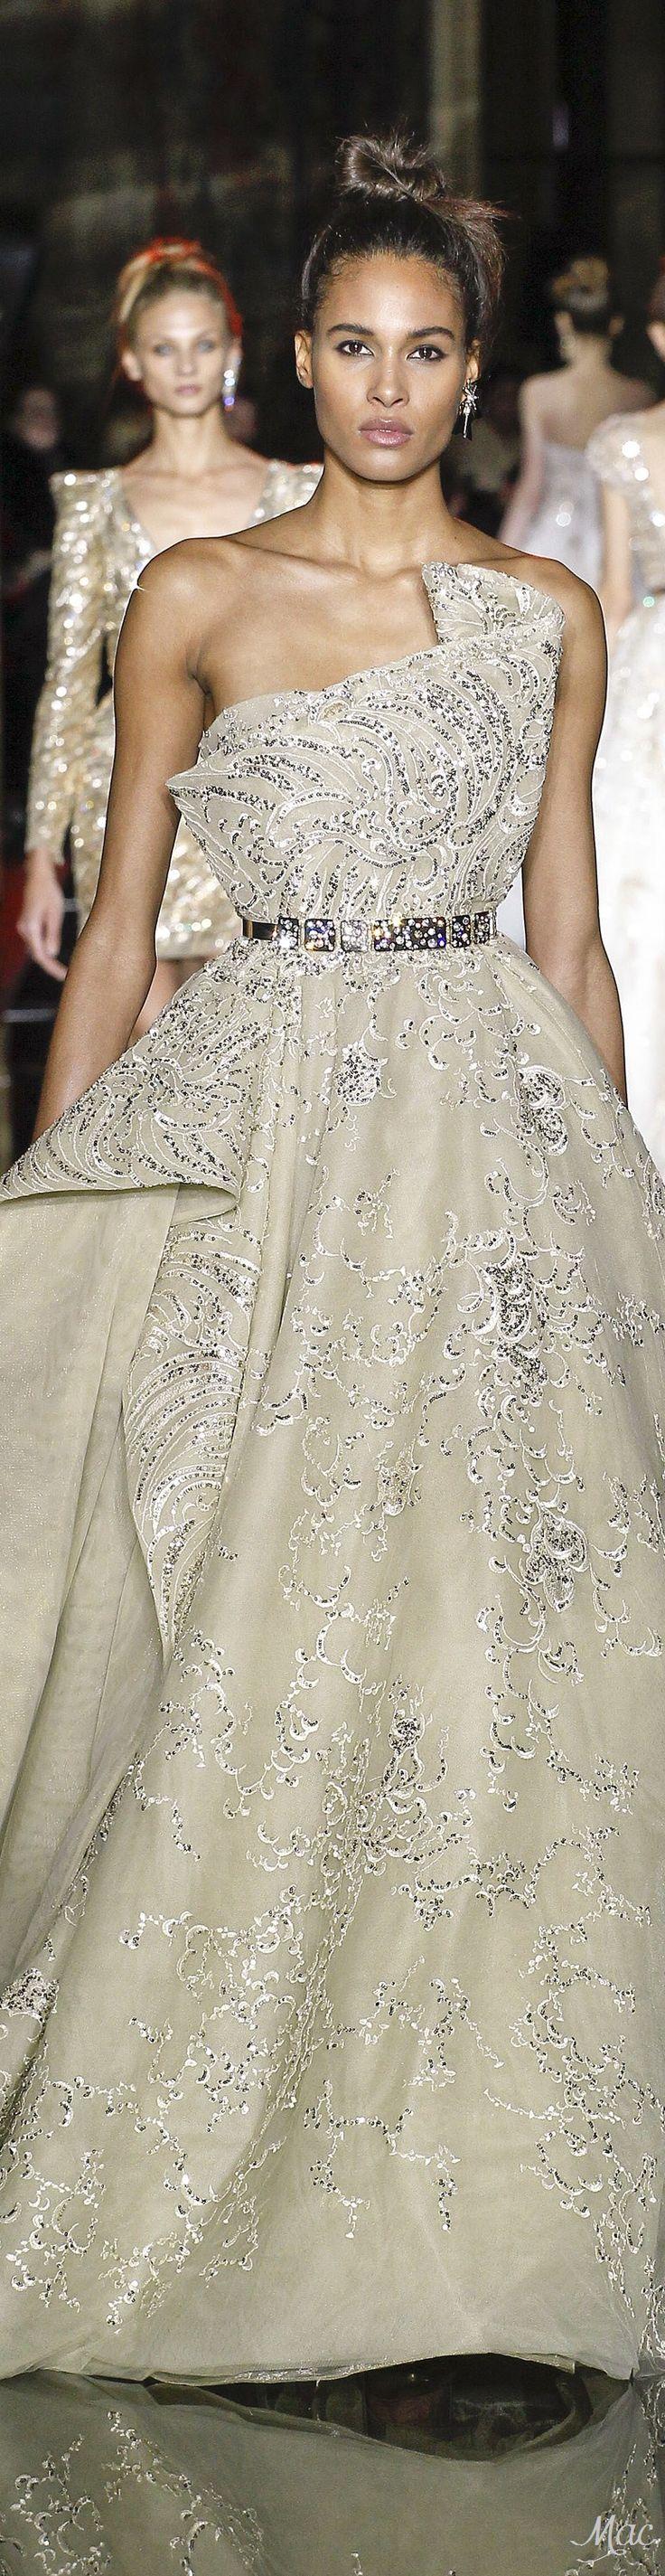 Spring 2017 Haute Couture Zuhair Murad